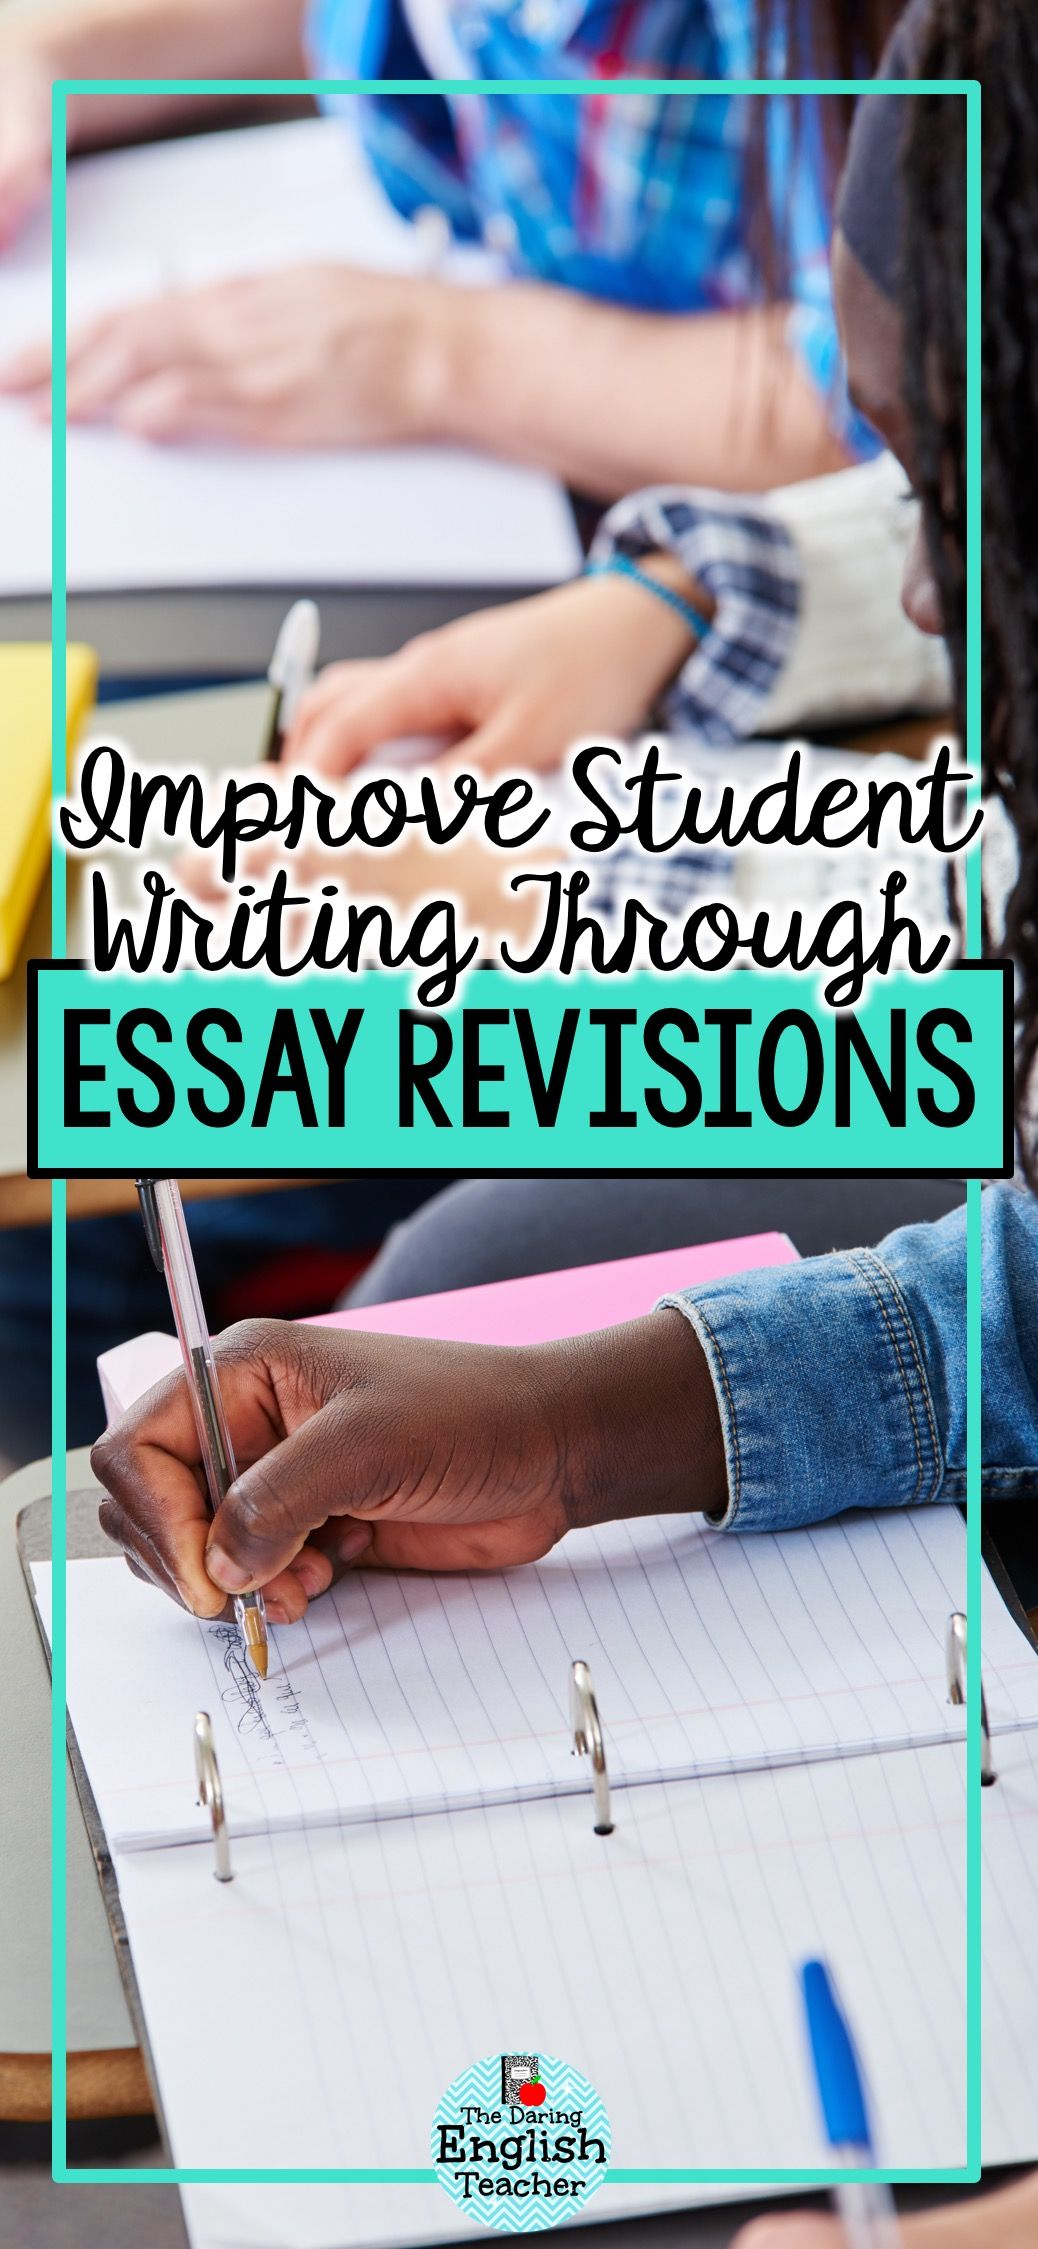 Essay news report